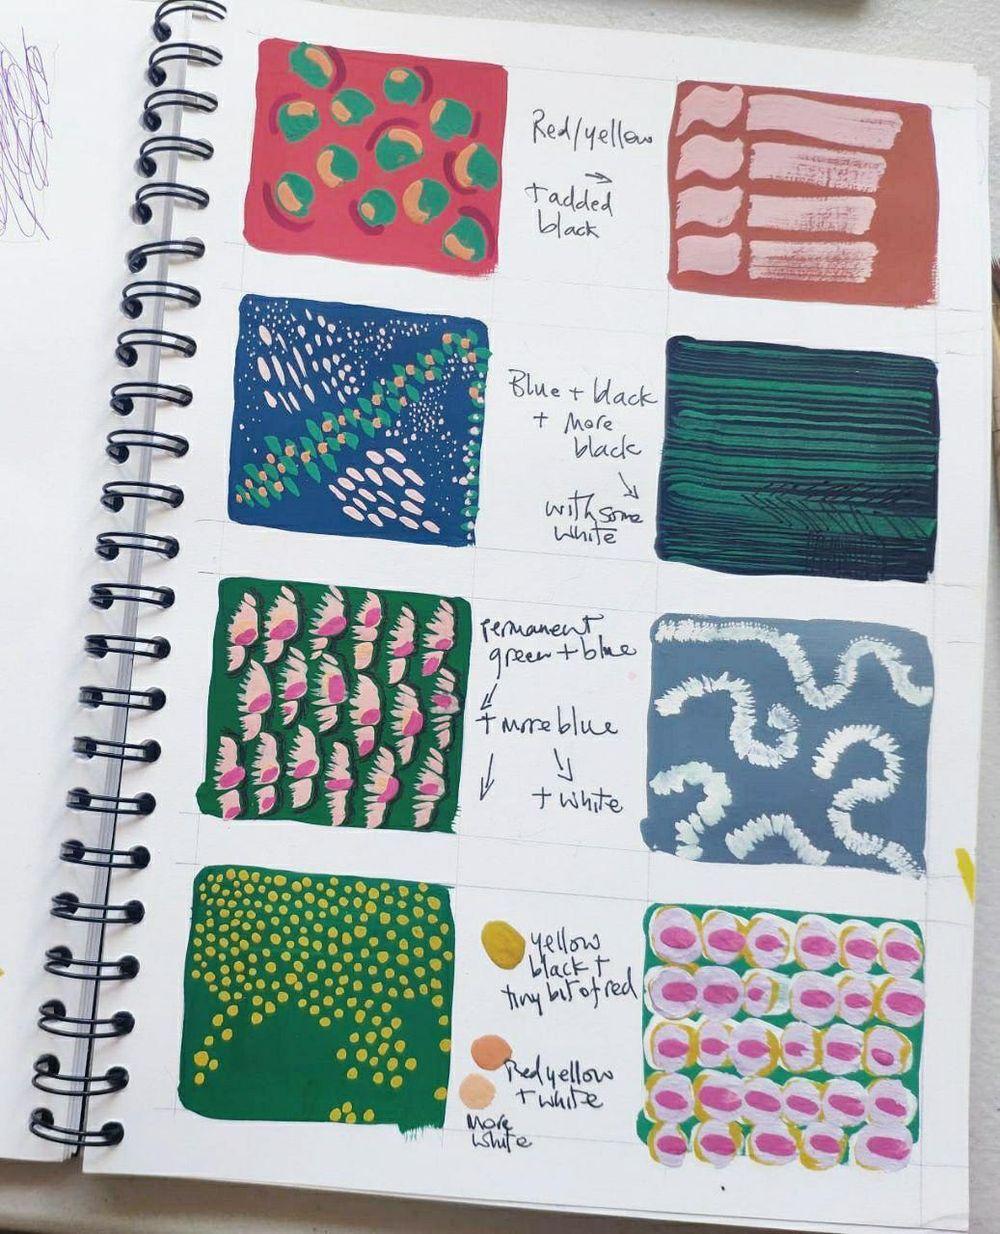 Pattern fun - image 4 - student project